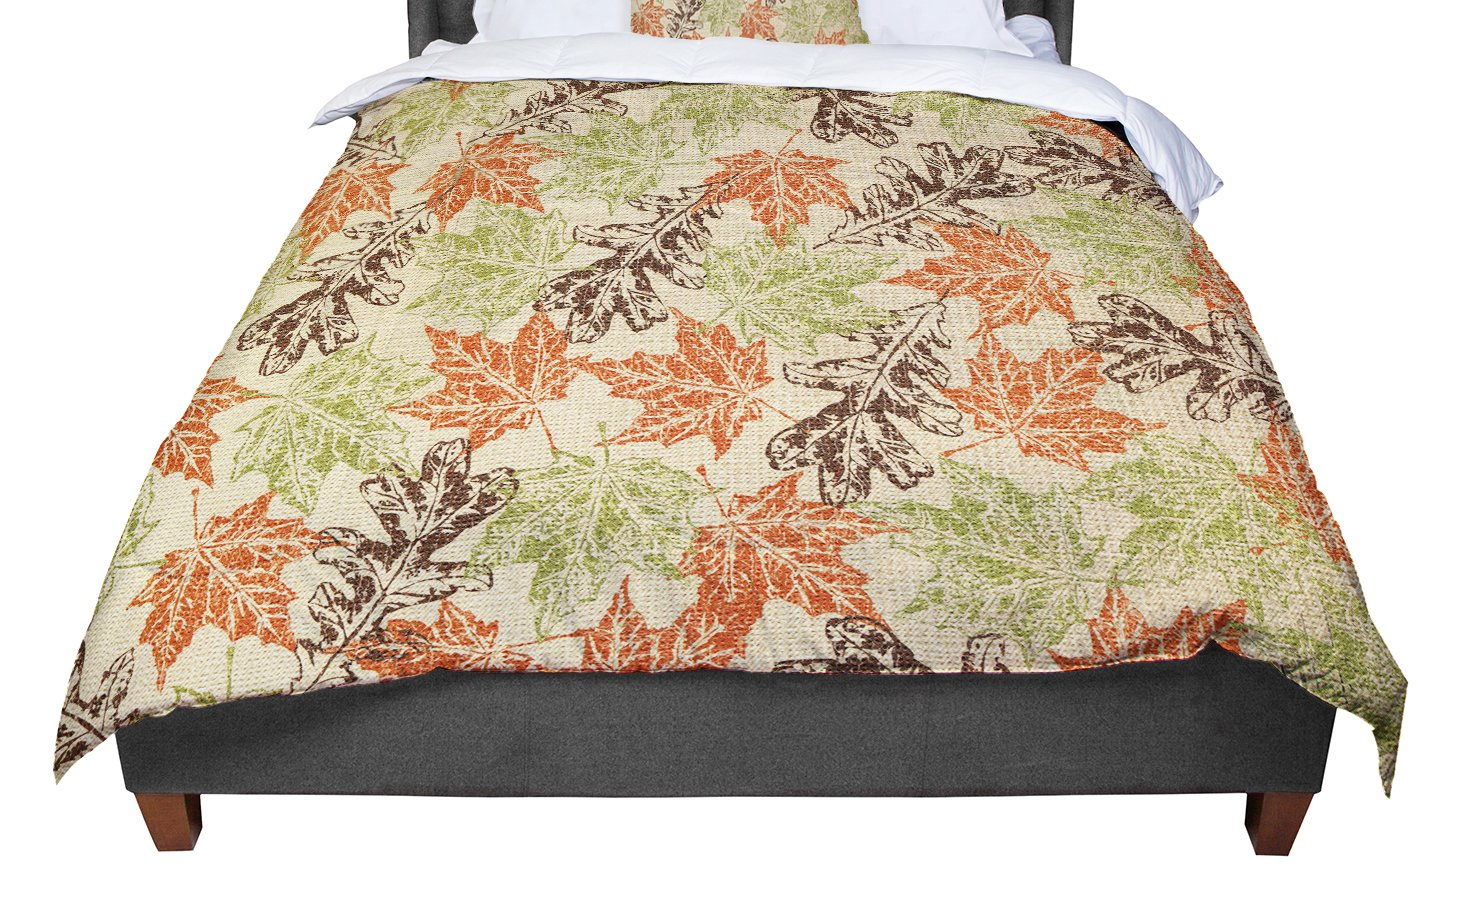 104 x 88 104 x 88 Kess InHouse Nic Squirrell Wild Meadow King Cotton Duvet Cover